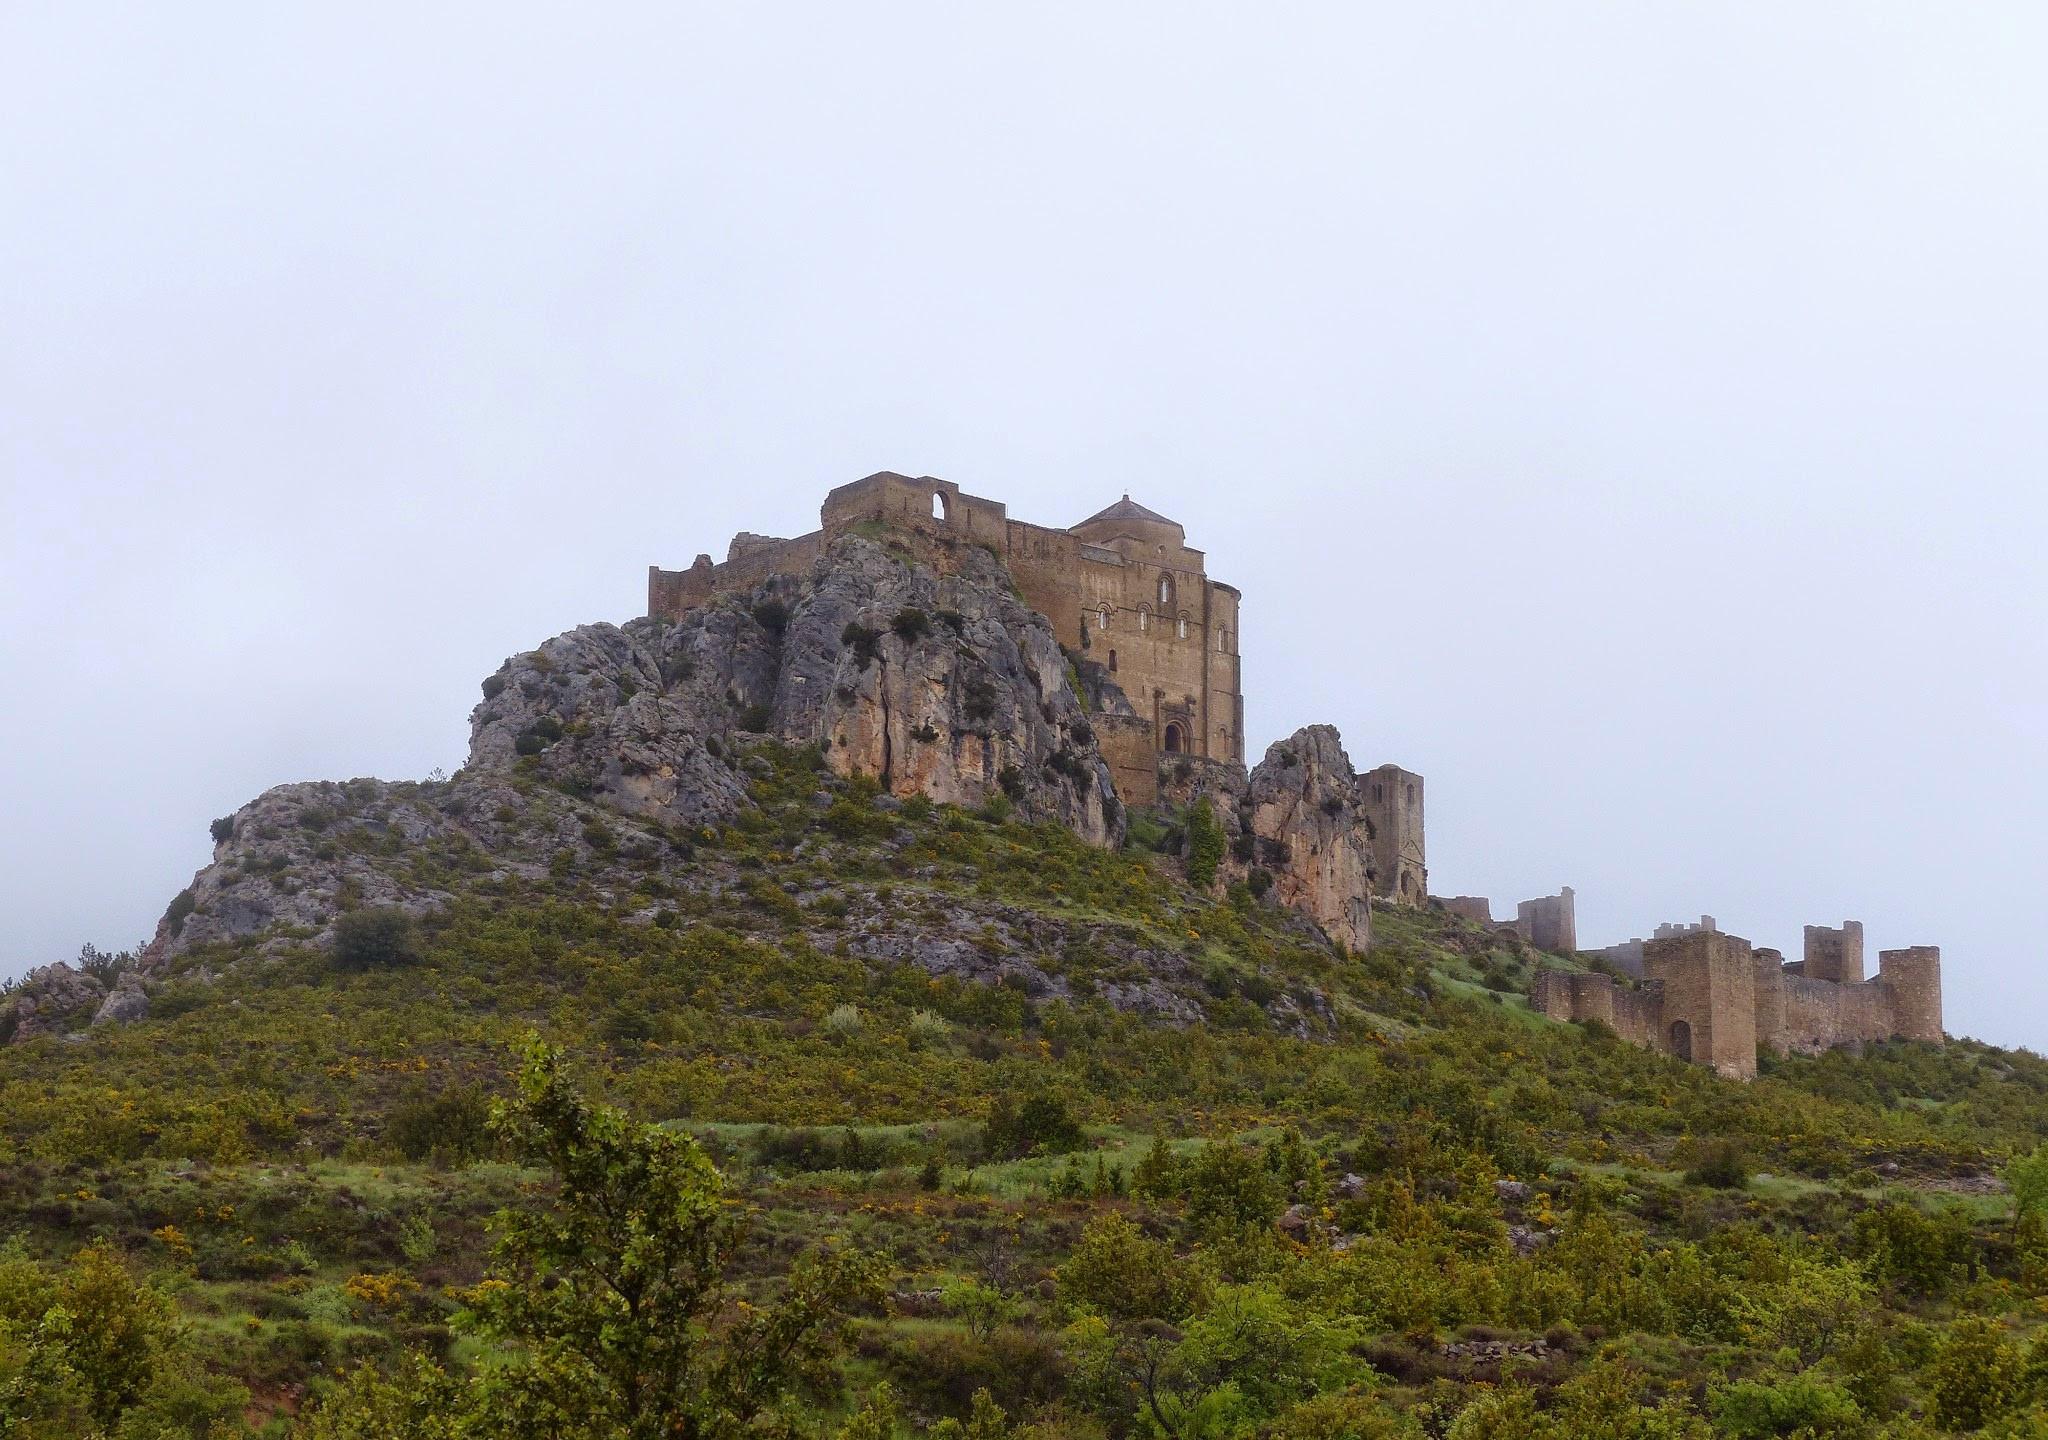 Castillo de Loarre - 09